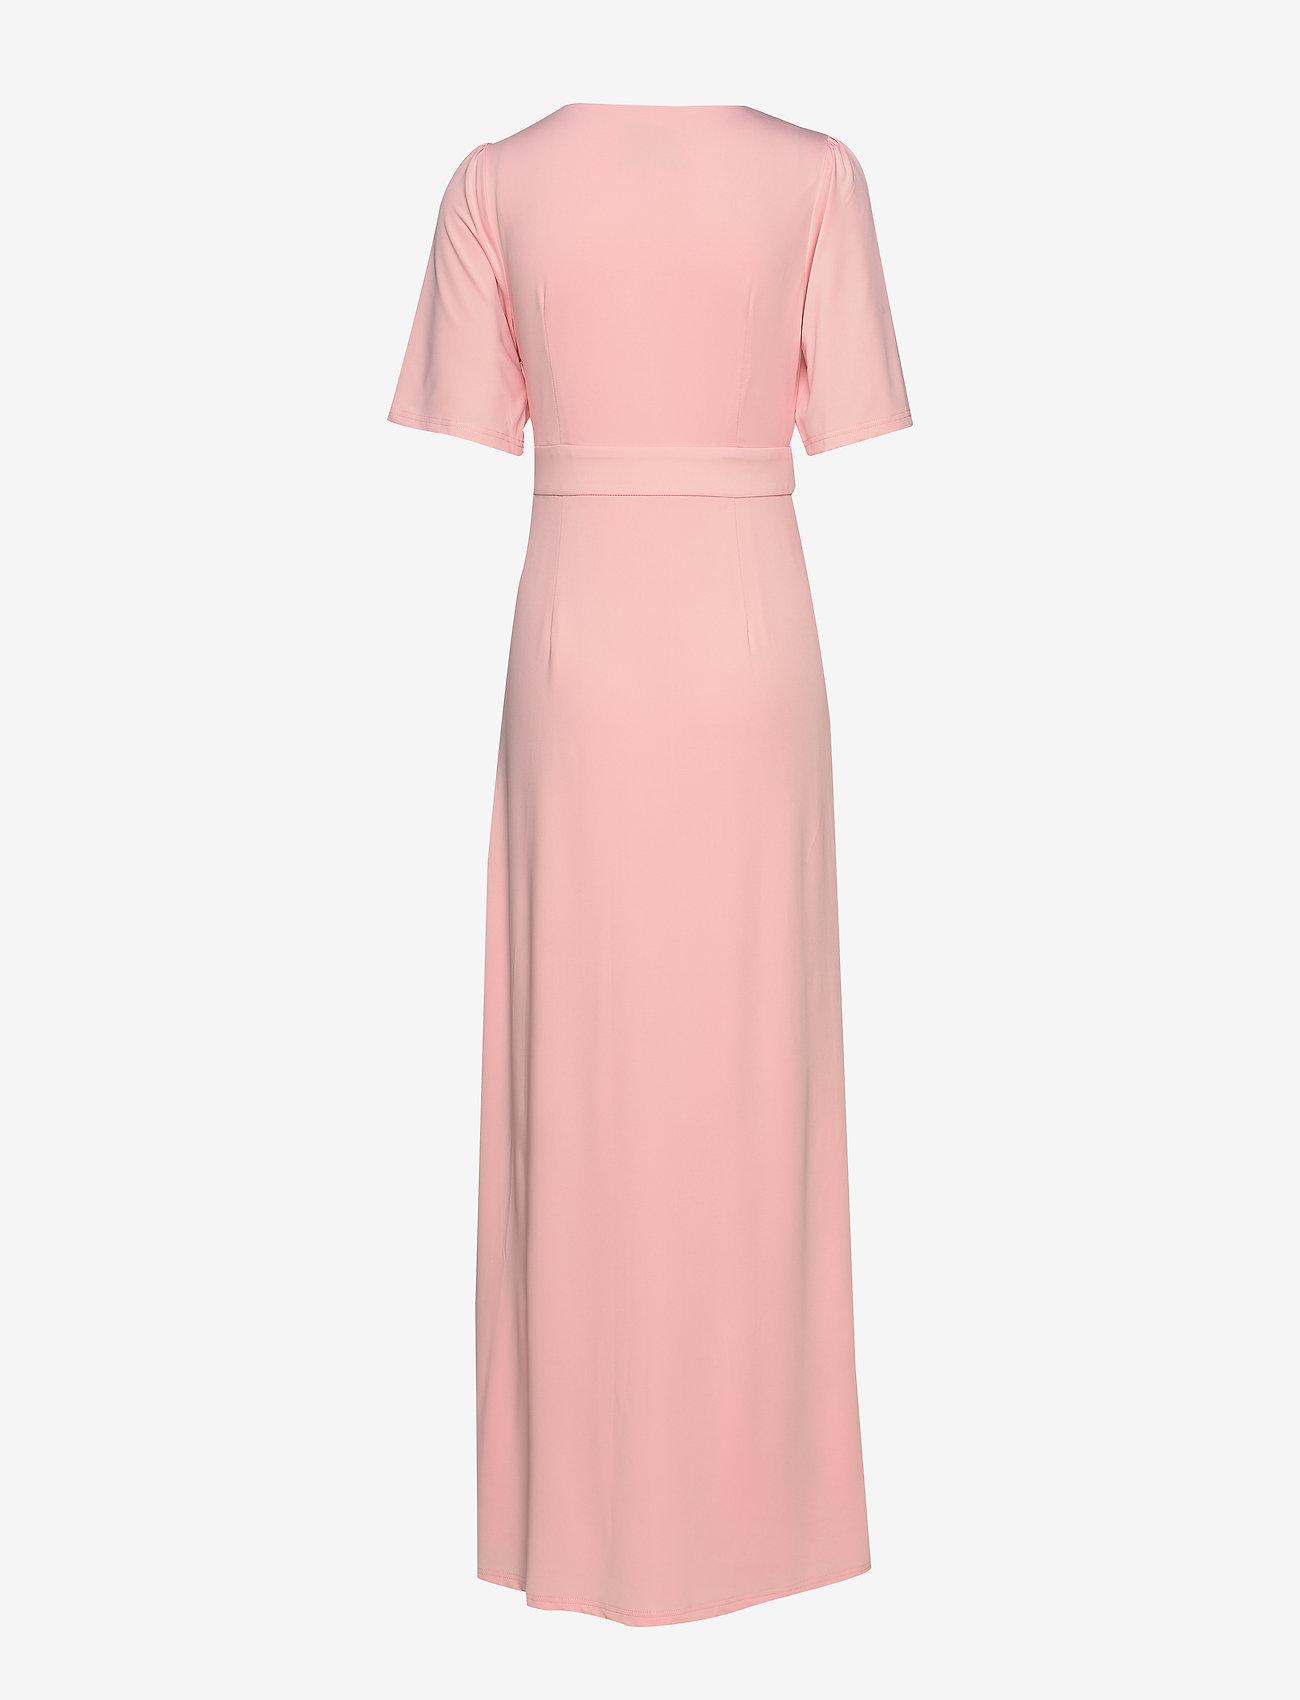 By Malina Amelina Dress - Dresses